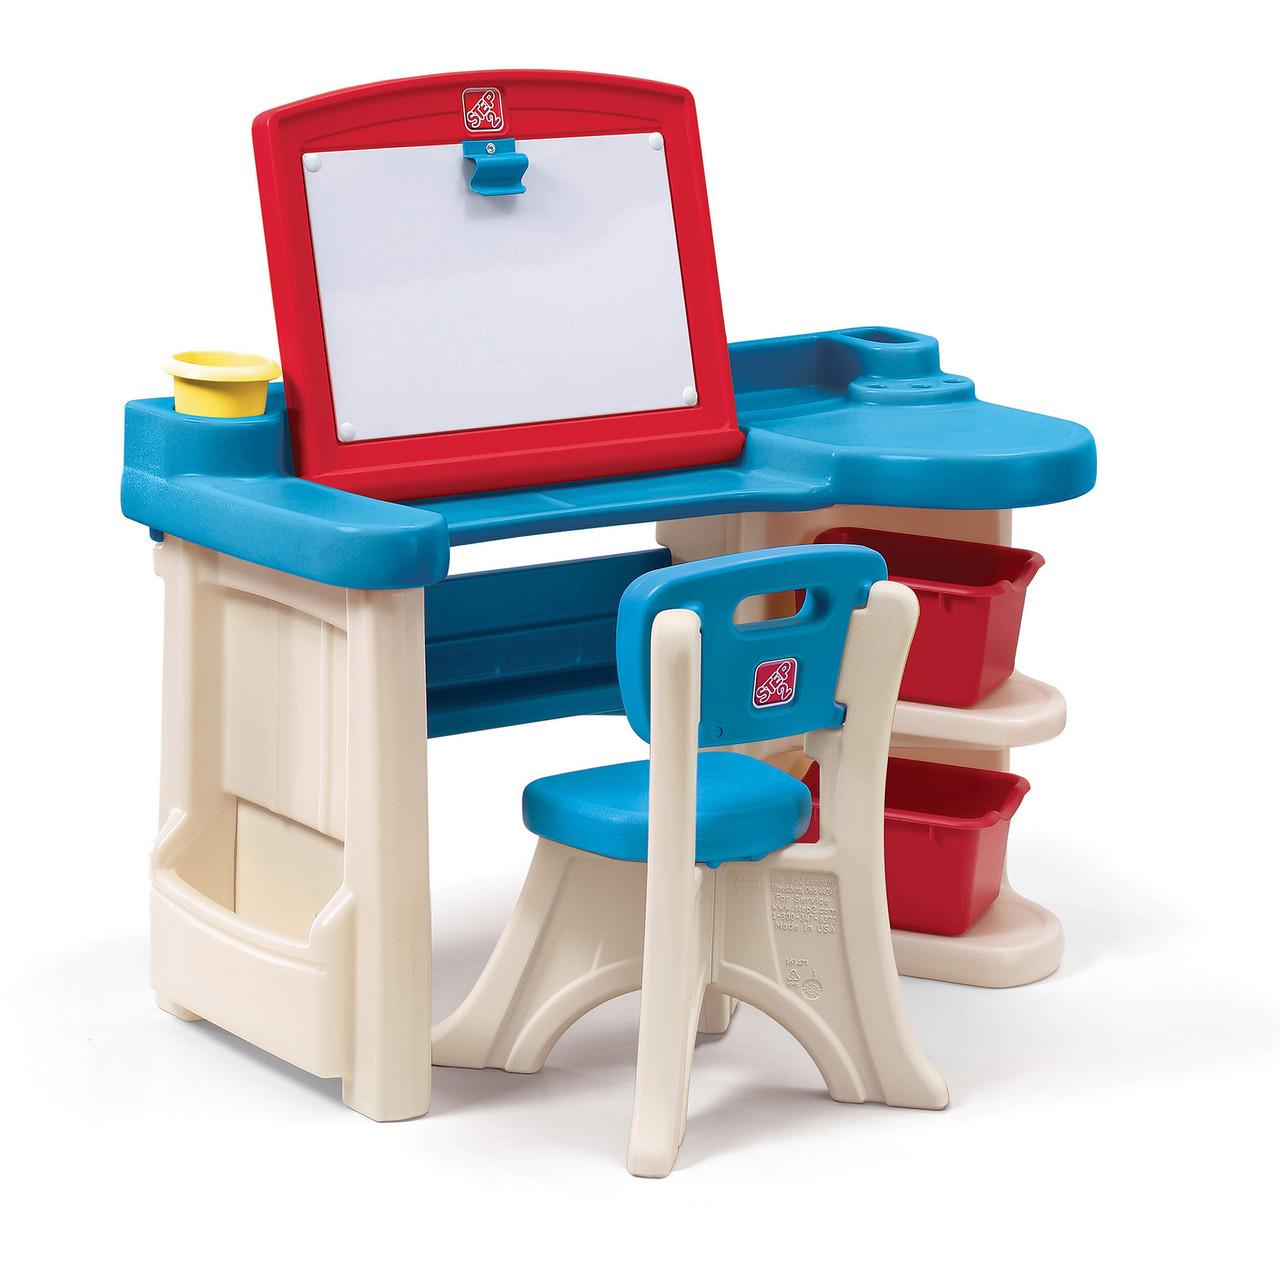 "Детский стол для творчества ""ART DESK REFRESH"" со стульчиком, 92х97х41см"